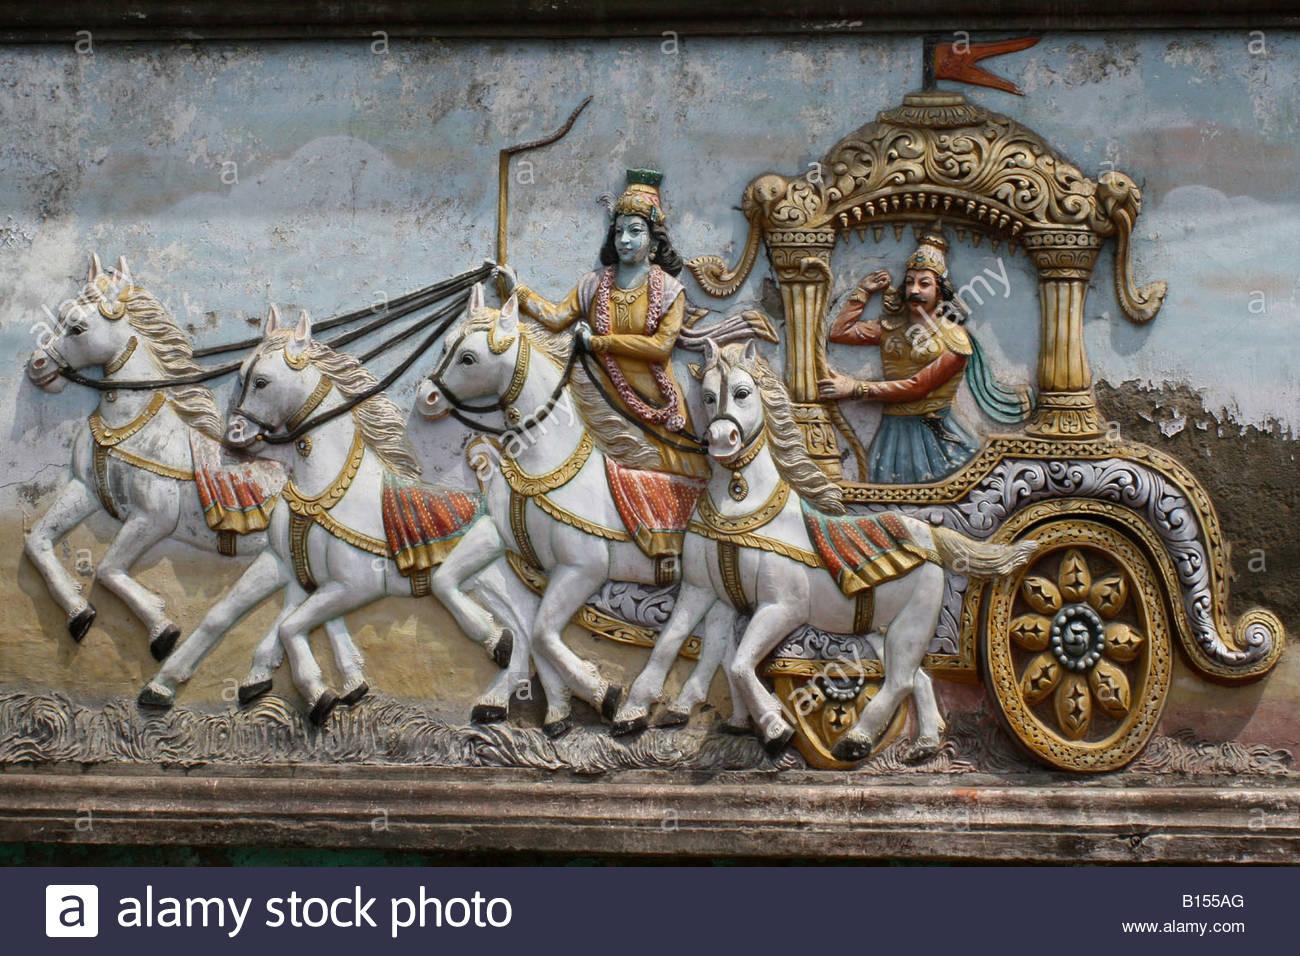 Arjuna And Krishna Stock Photos & Arjuna And Krishna Stock Images.